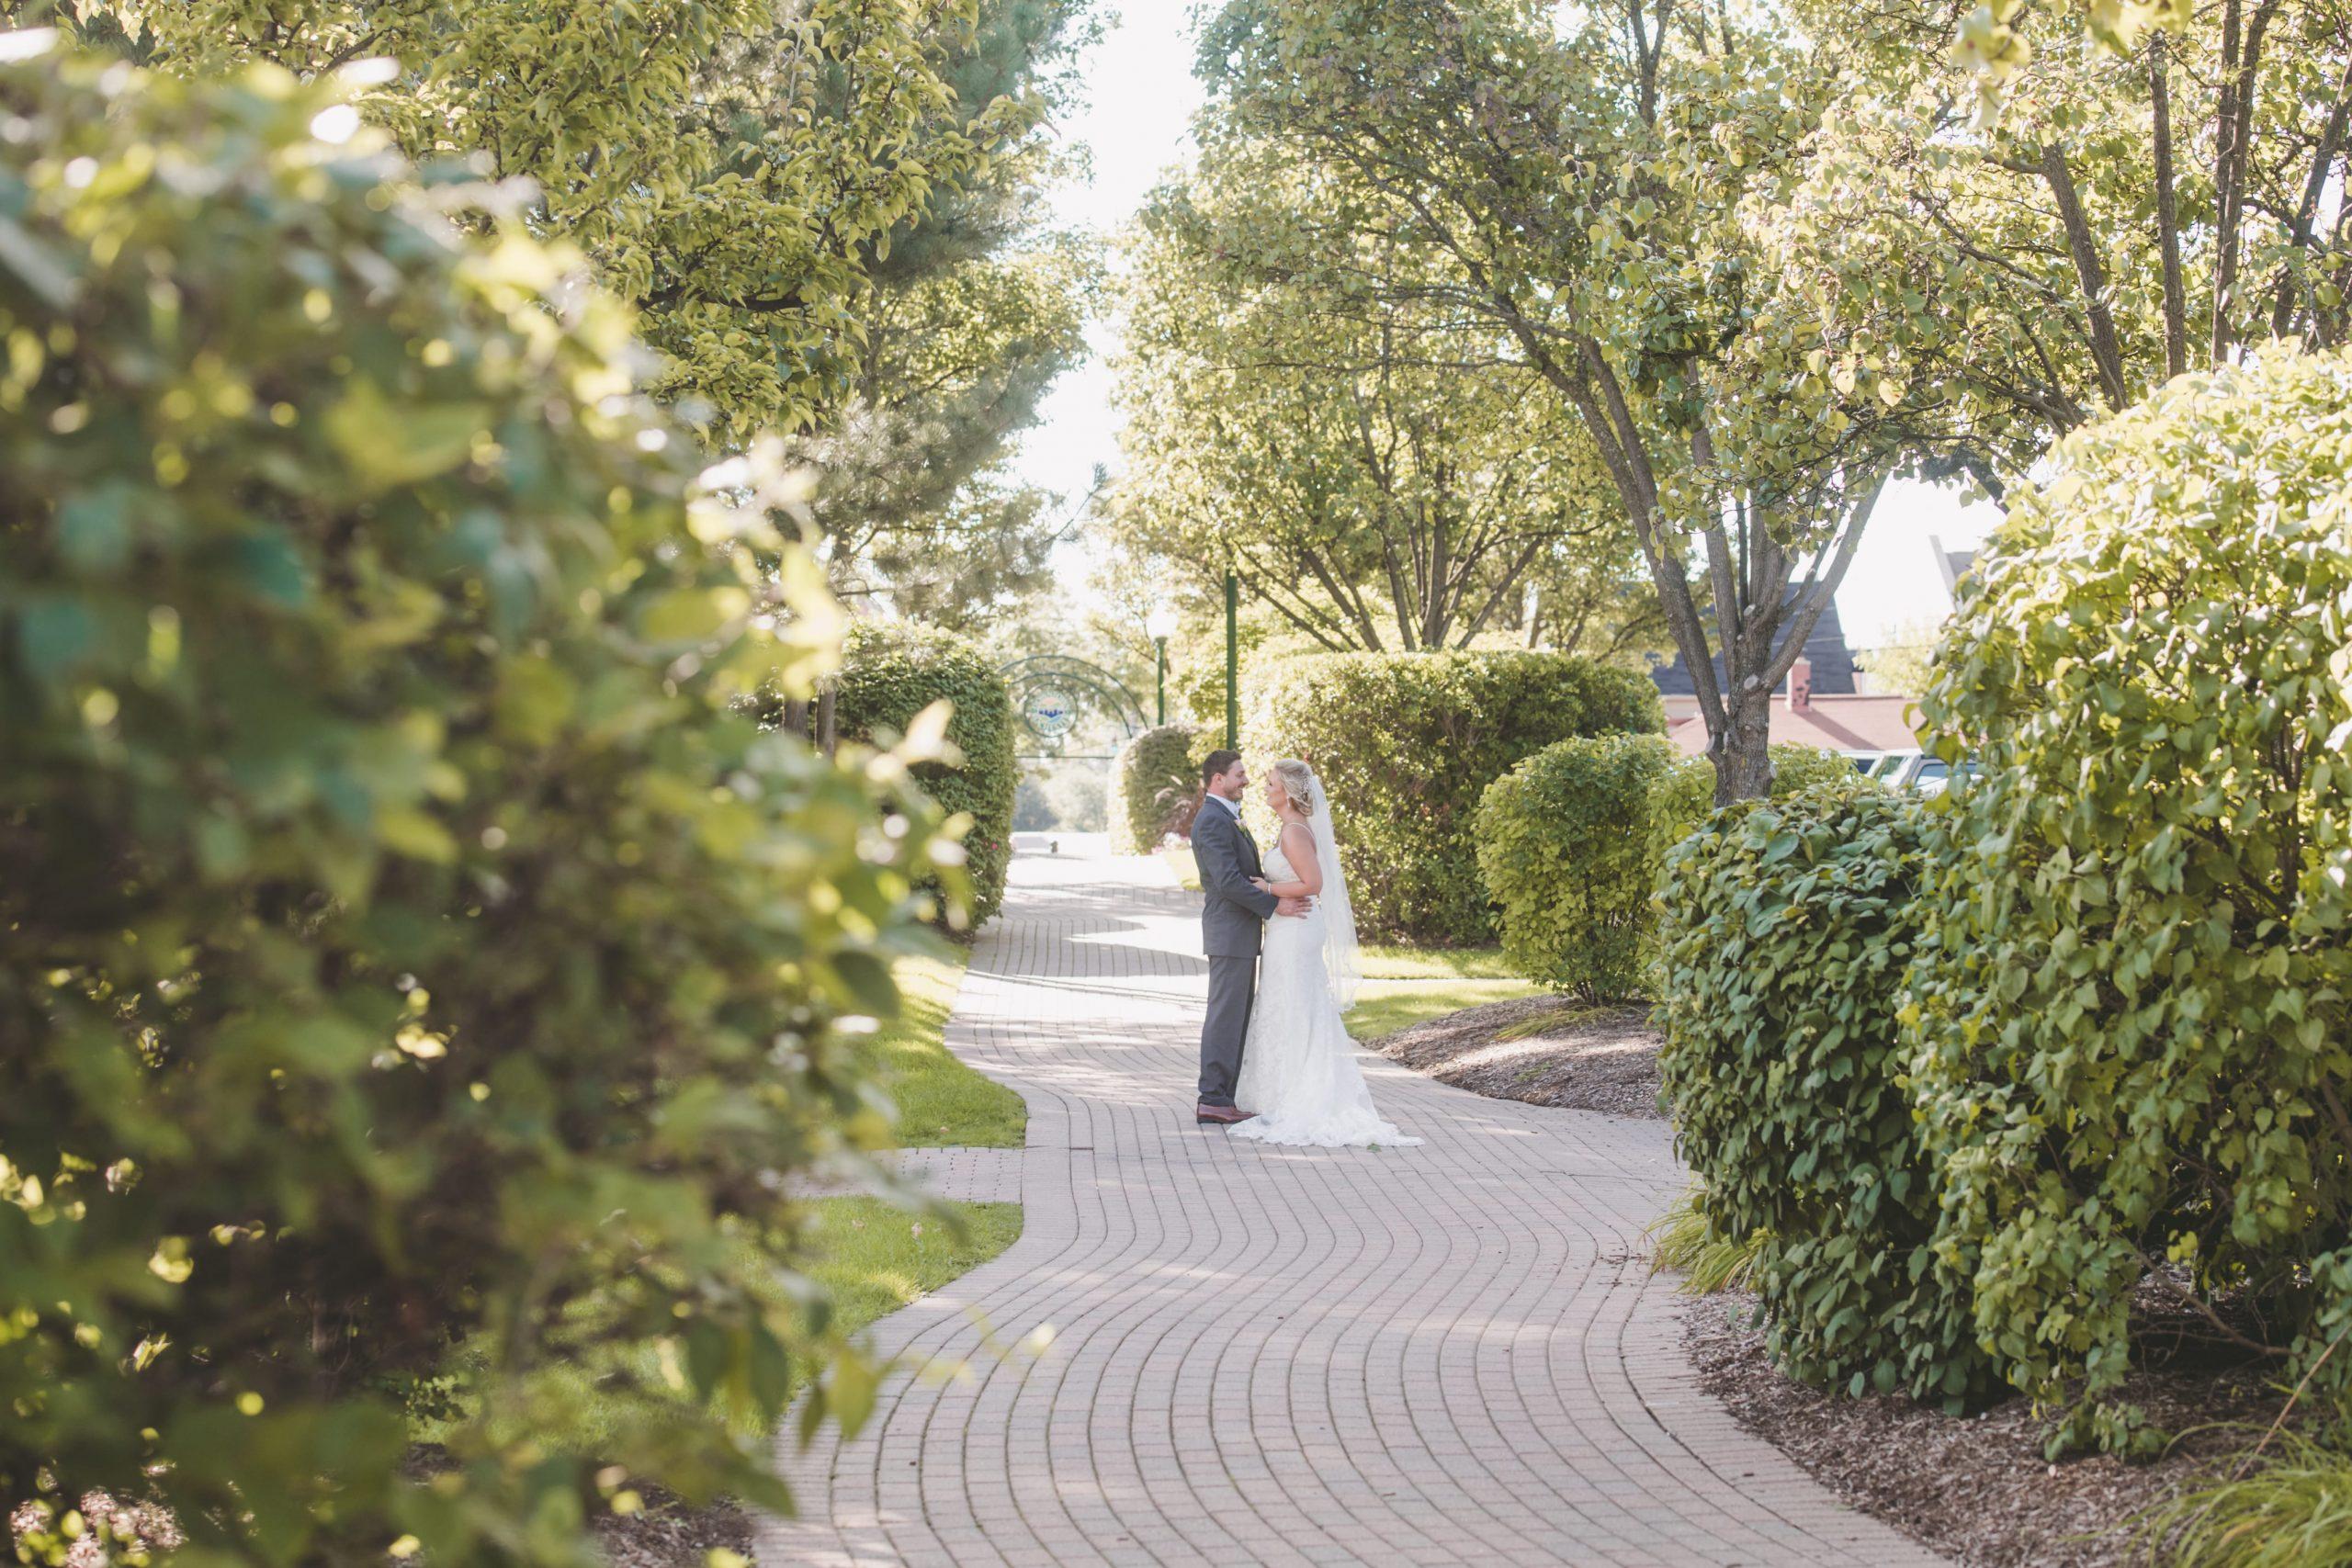 romantics outside on stone path